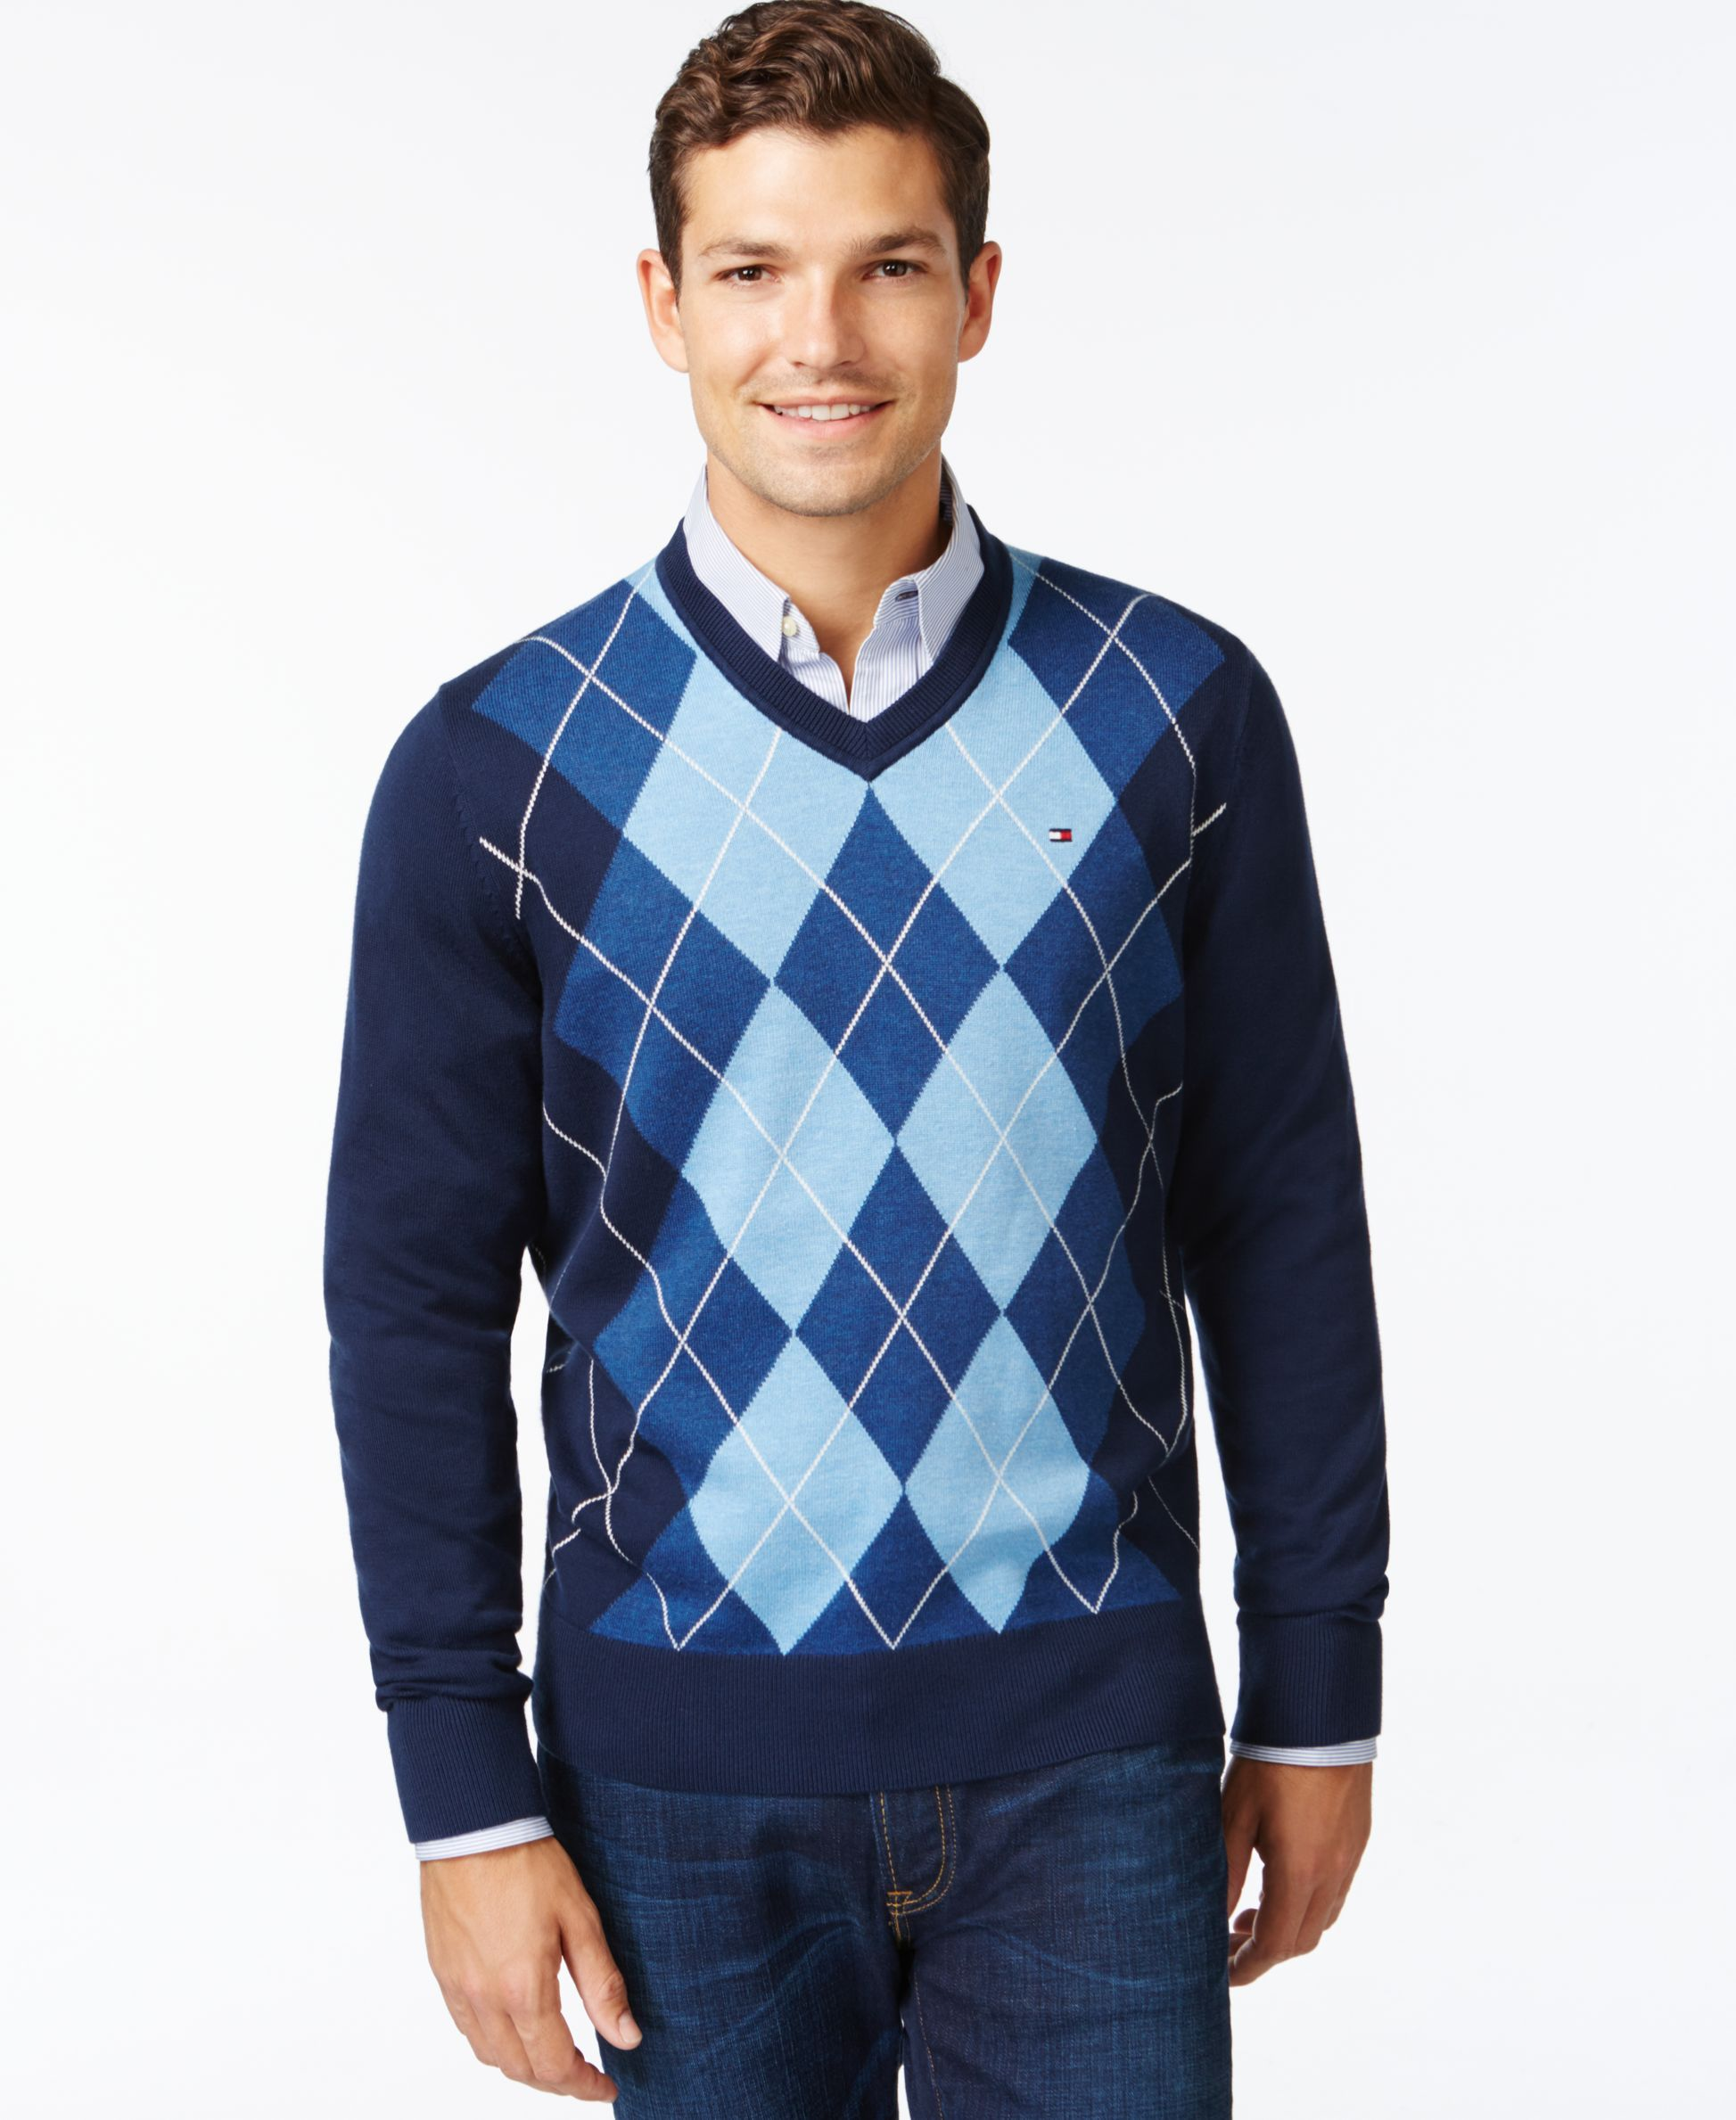 Tommy Hilfiger Signature Argyle V-Neck Sweater  3b0fc90d41da